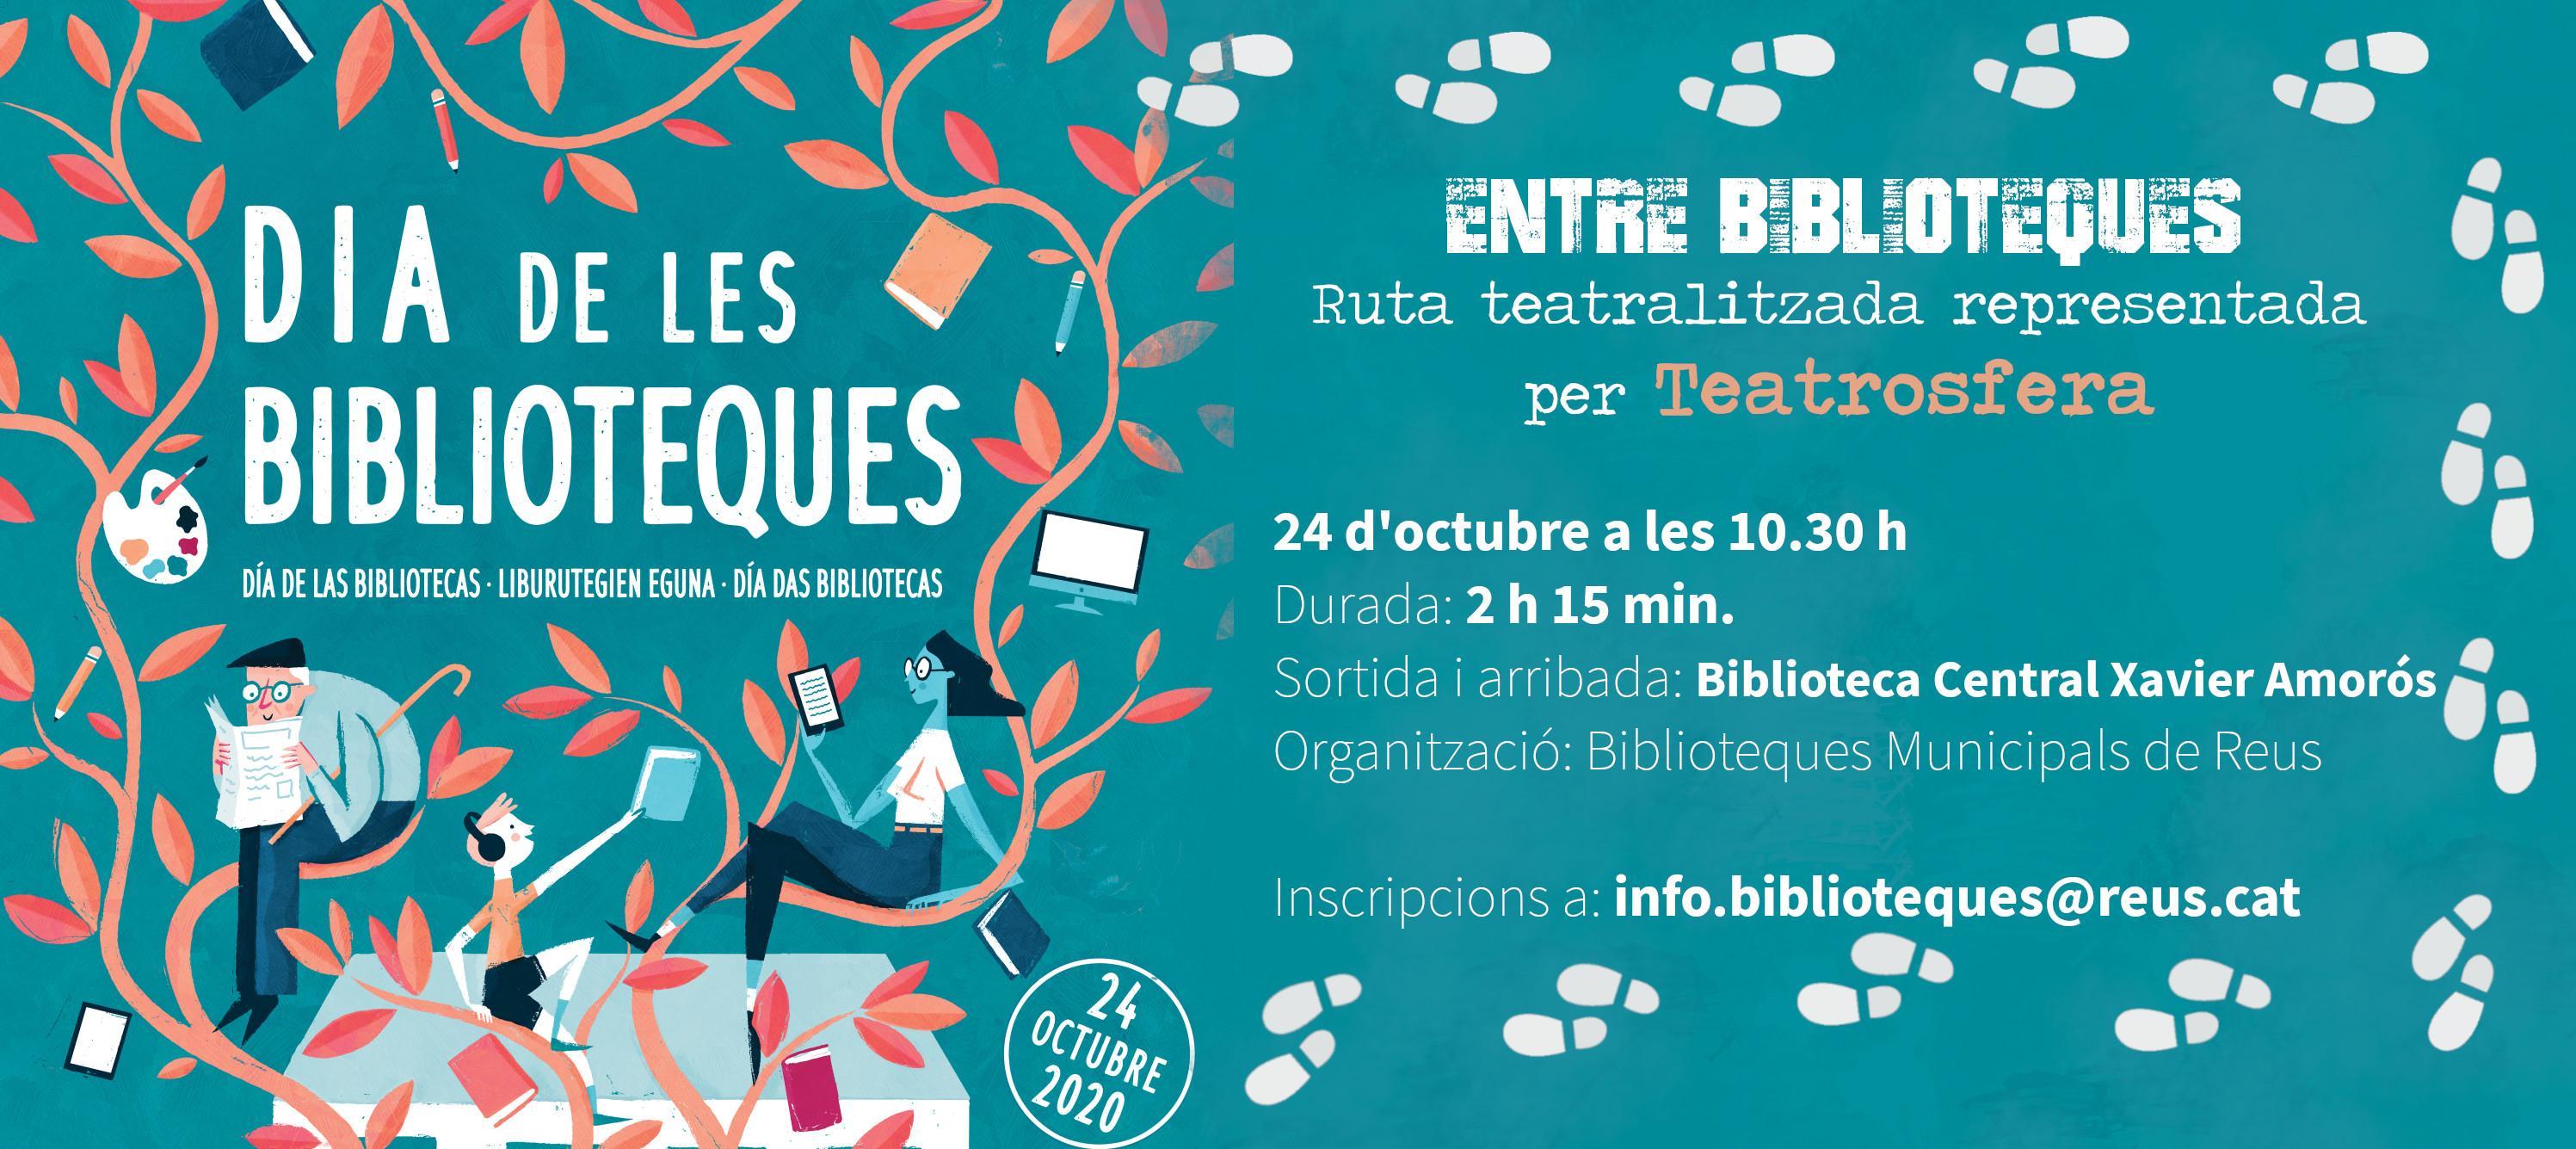 Biblioteca Central Xavier Amorós: Celebració del dia de la Biblioteca Pública